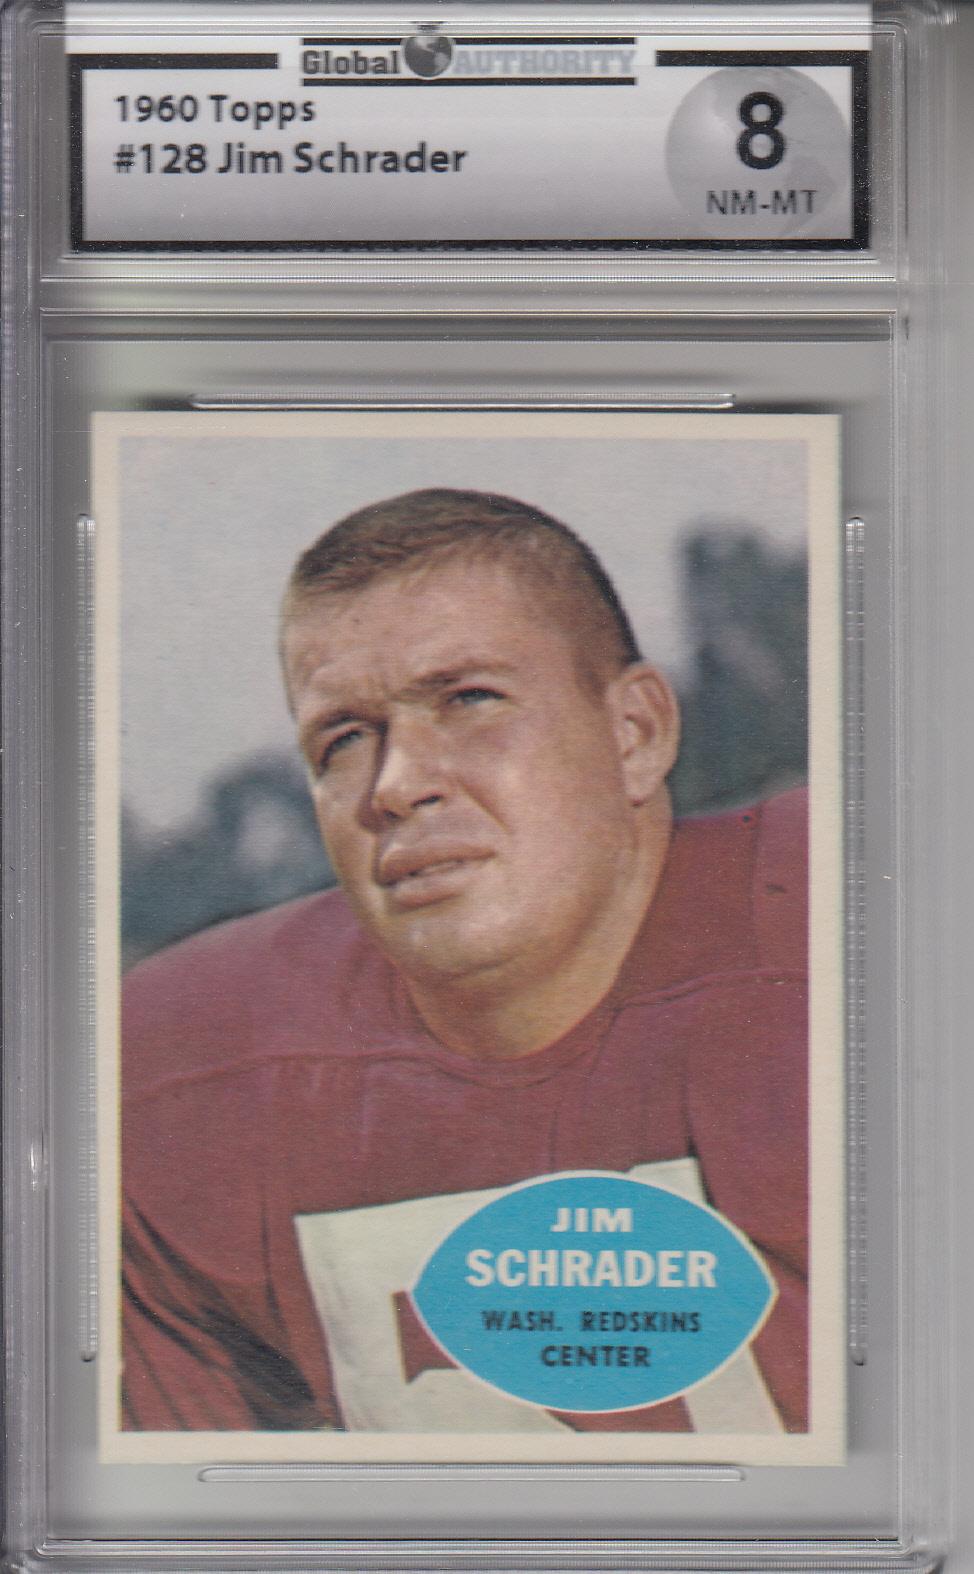 1960 Topps #128 Jim Schrader REDSKINS GAI 8 NM-MT Z20152